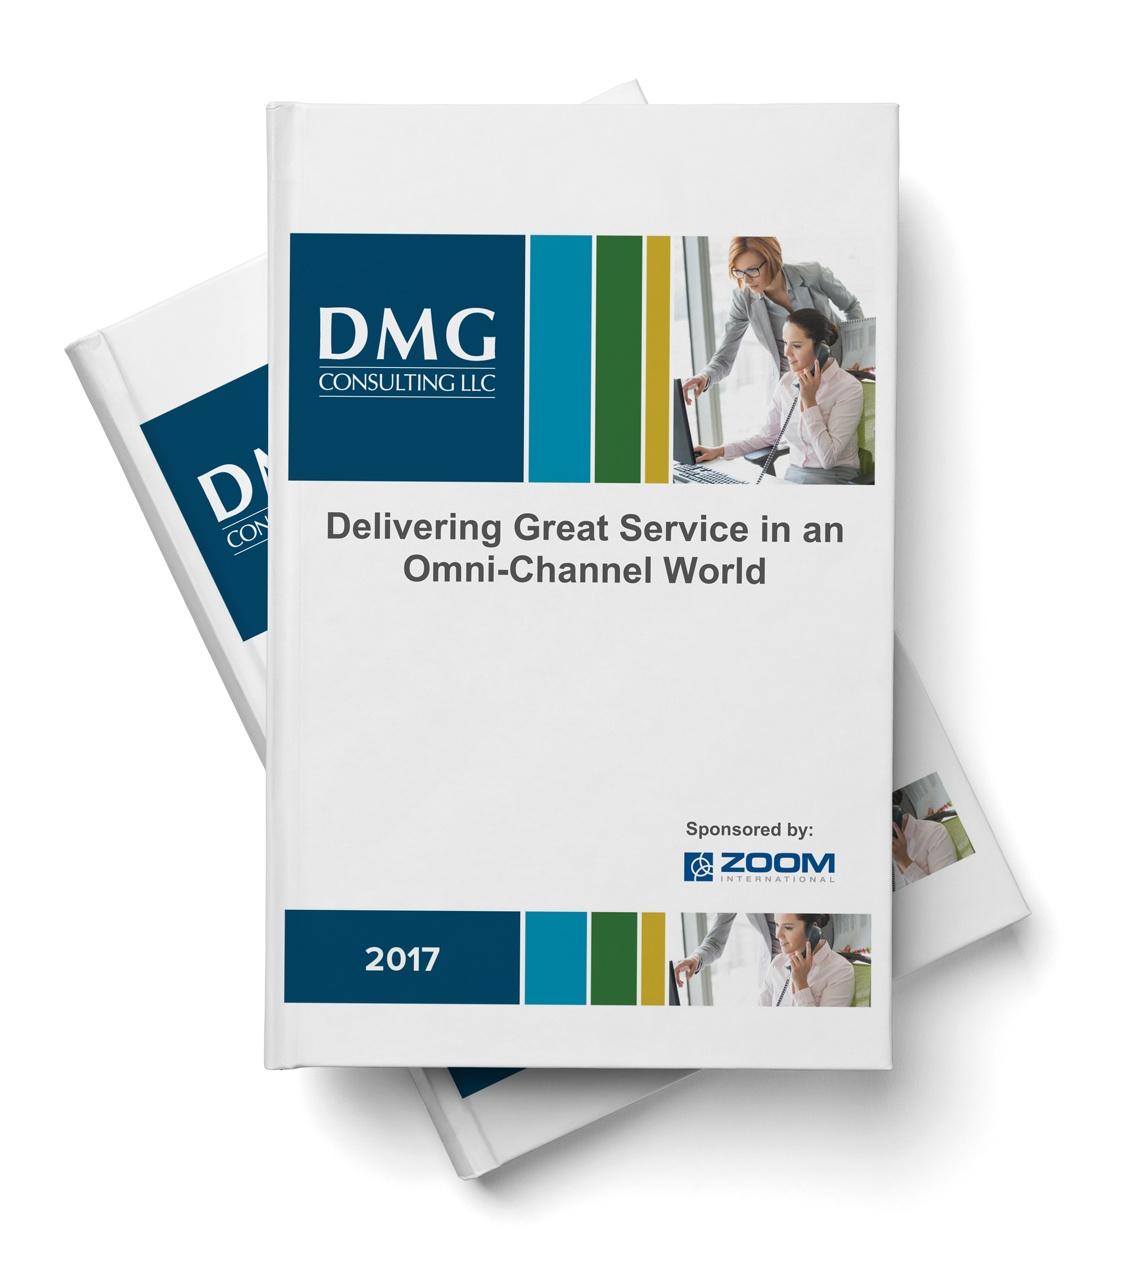 DMG_WP_OC_GreatService_01.jpg